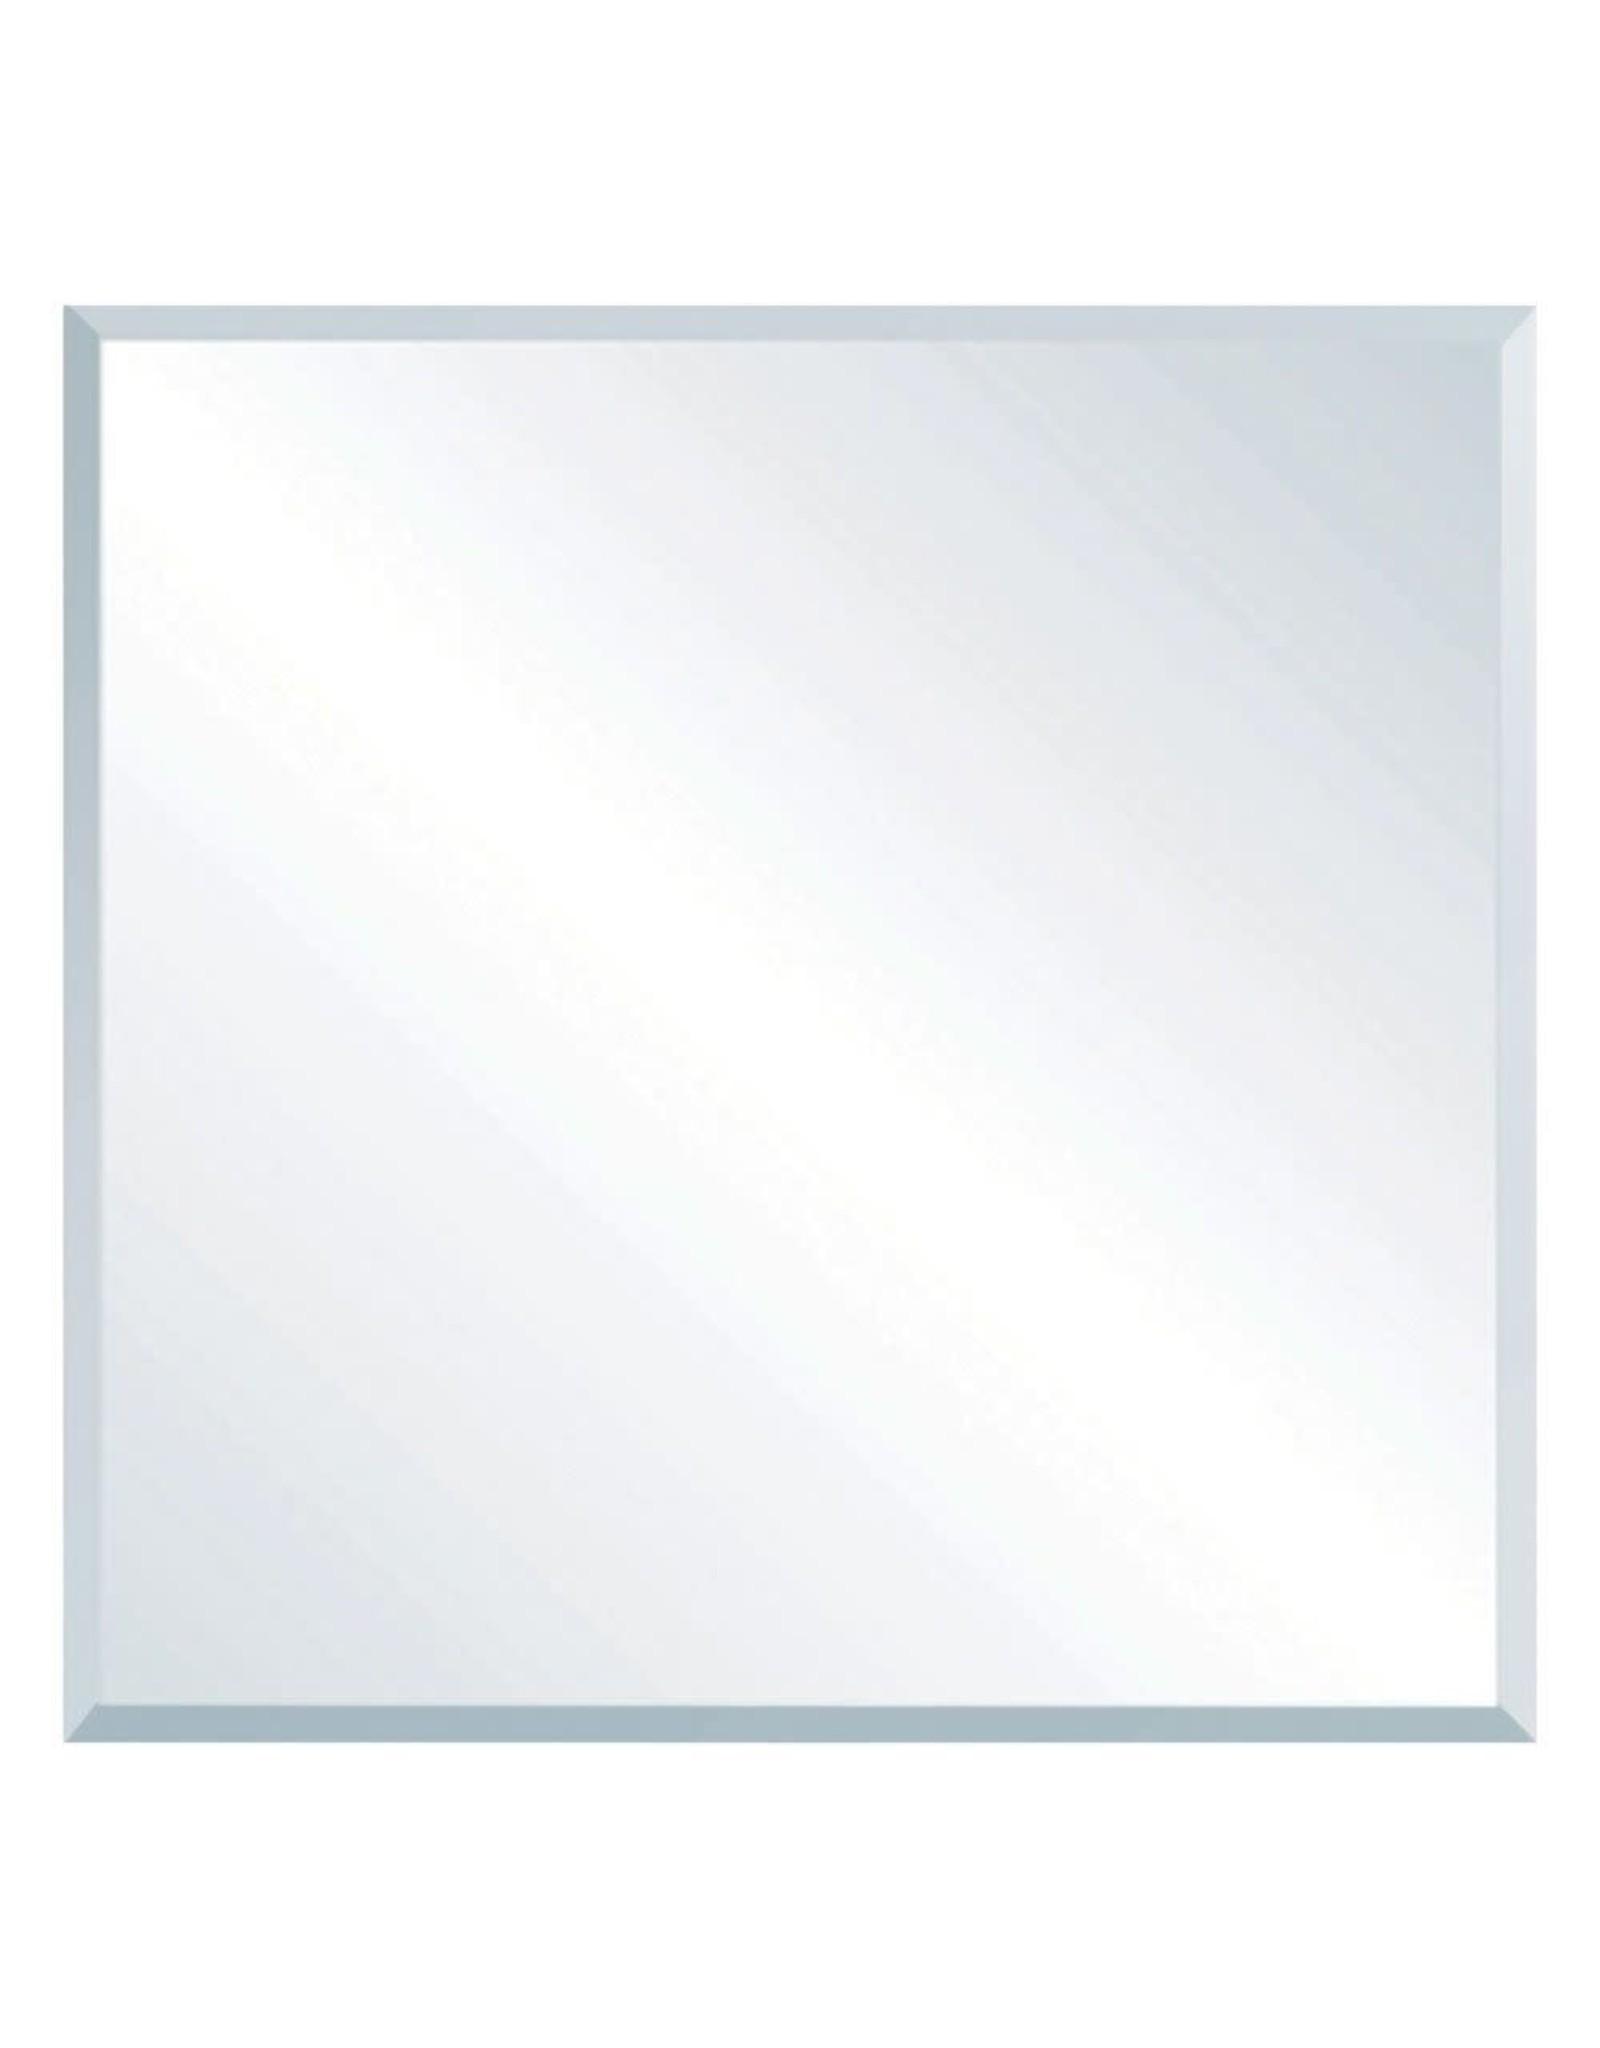 FIENZA 1200x900, FIENZA, Bevel Edge Mirror